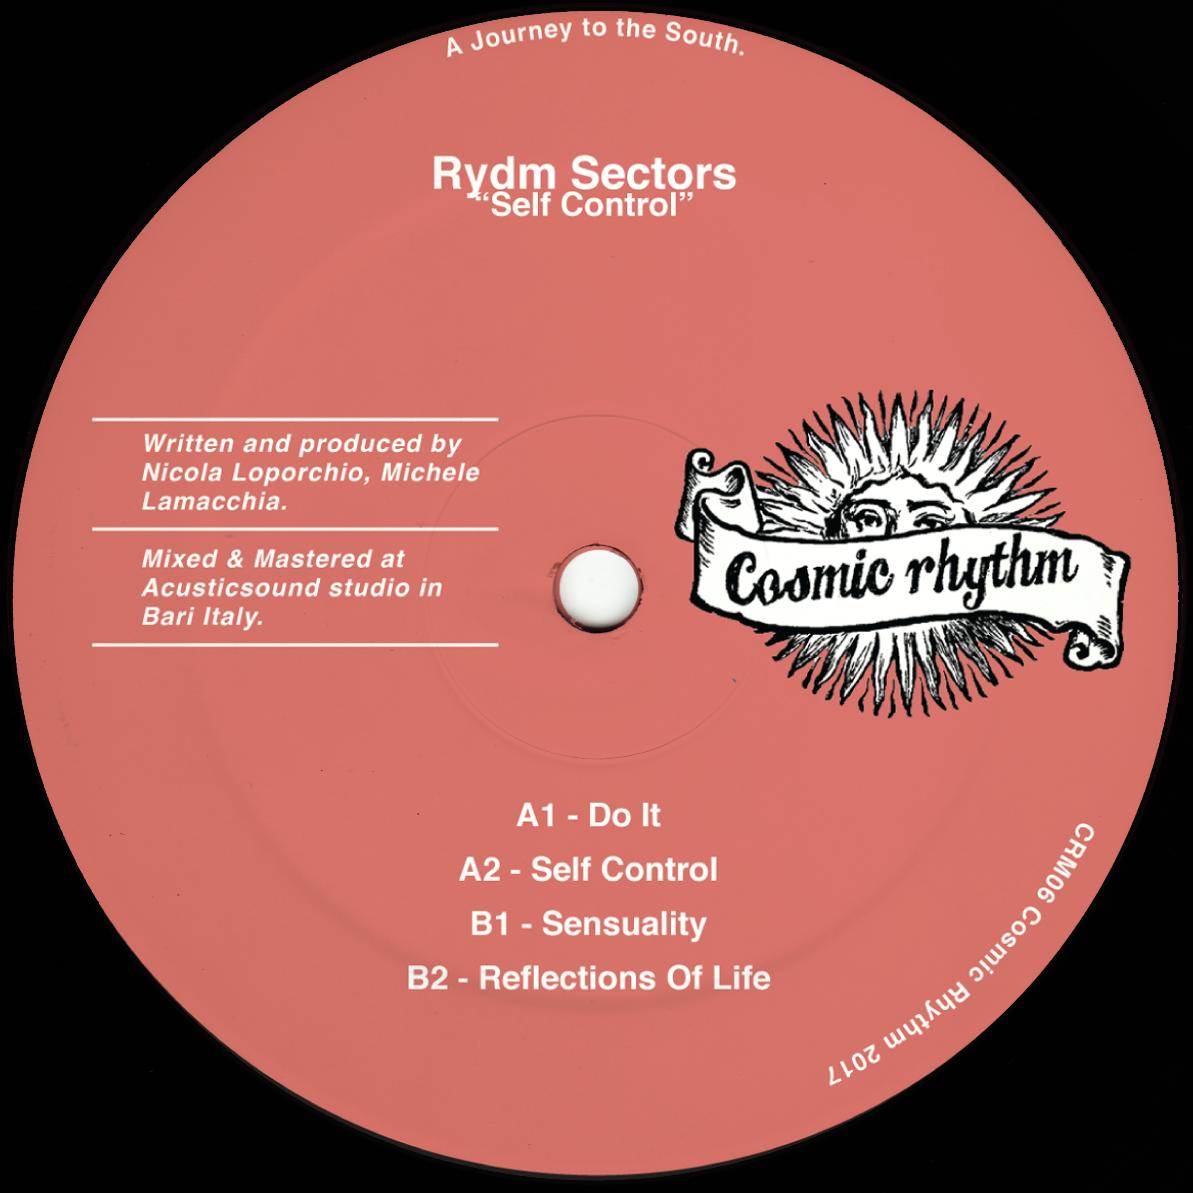 PREMIERE – Rydm Sectors – Reflections Of Love (Cosmic Rhythm)